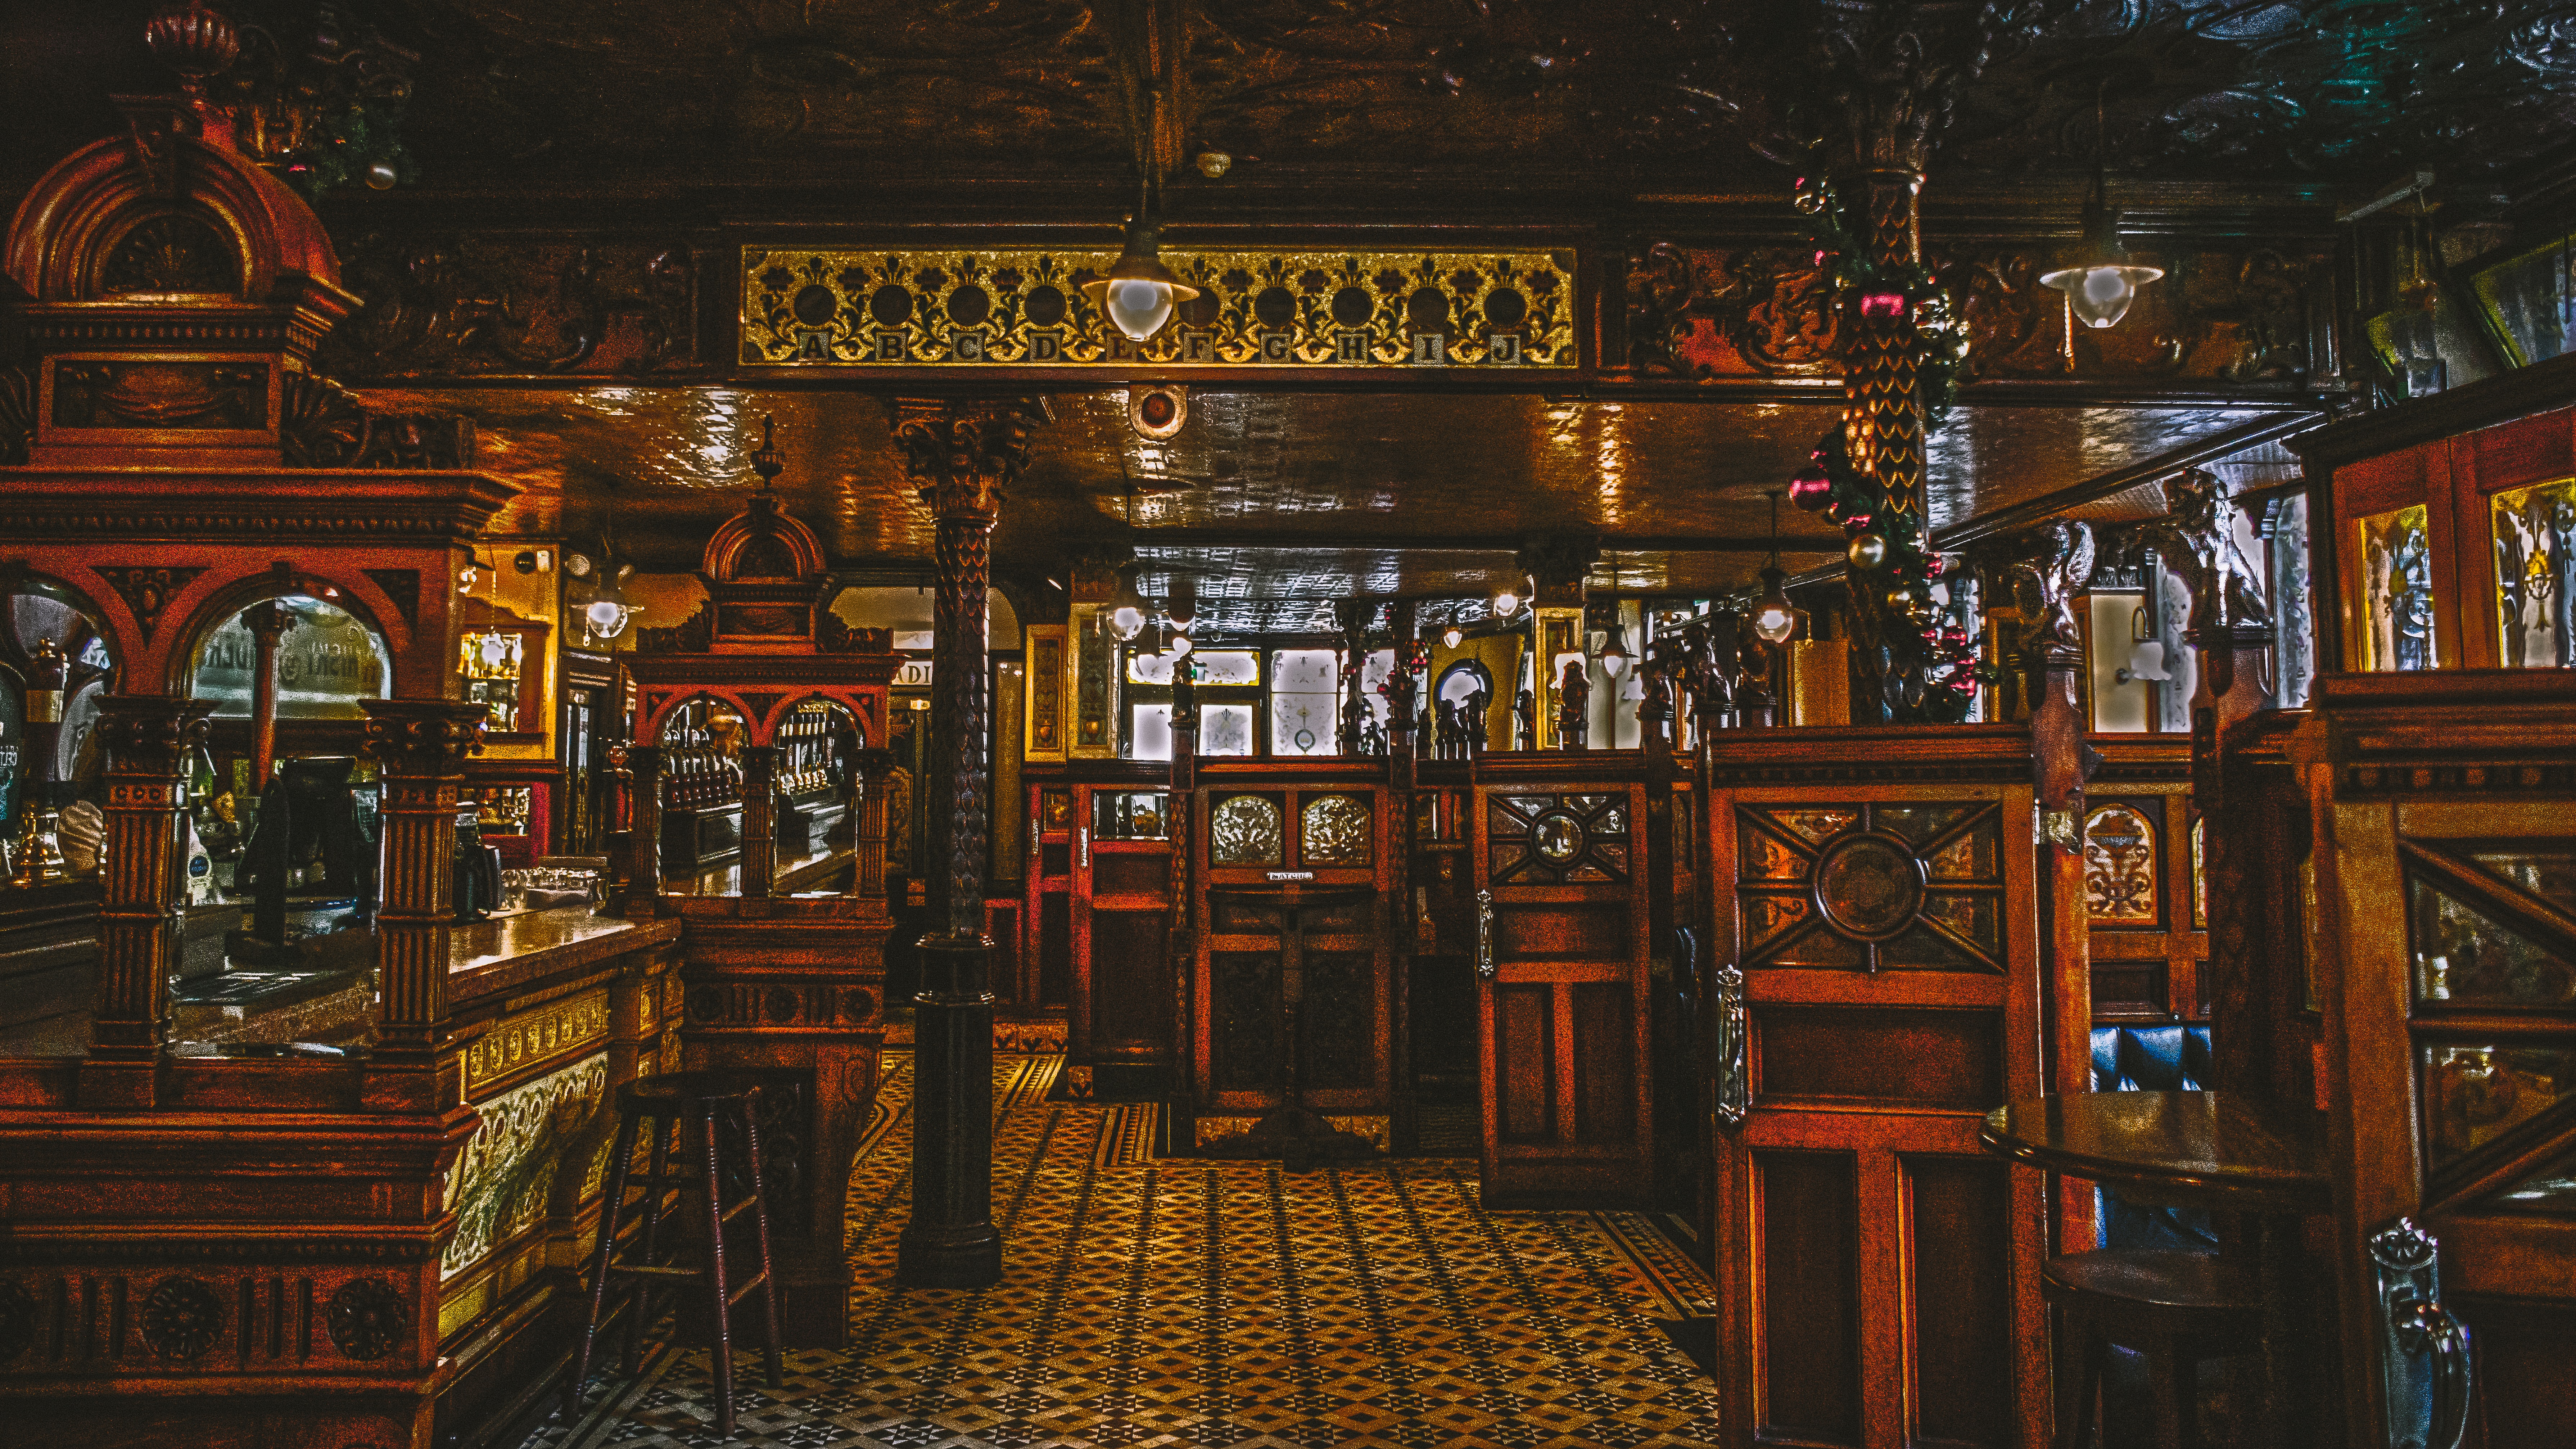 Pub 2 Photo by K. Mitch Hodge on Unsplash